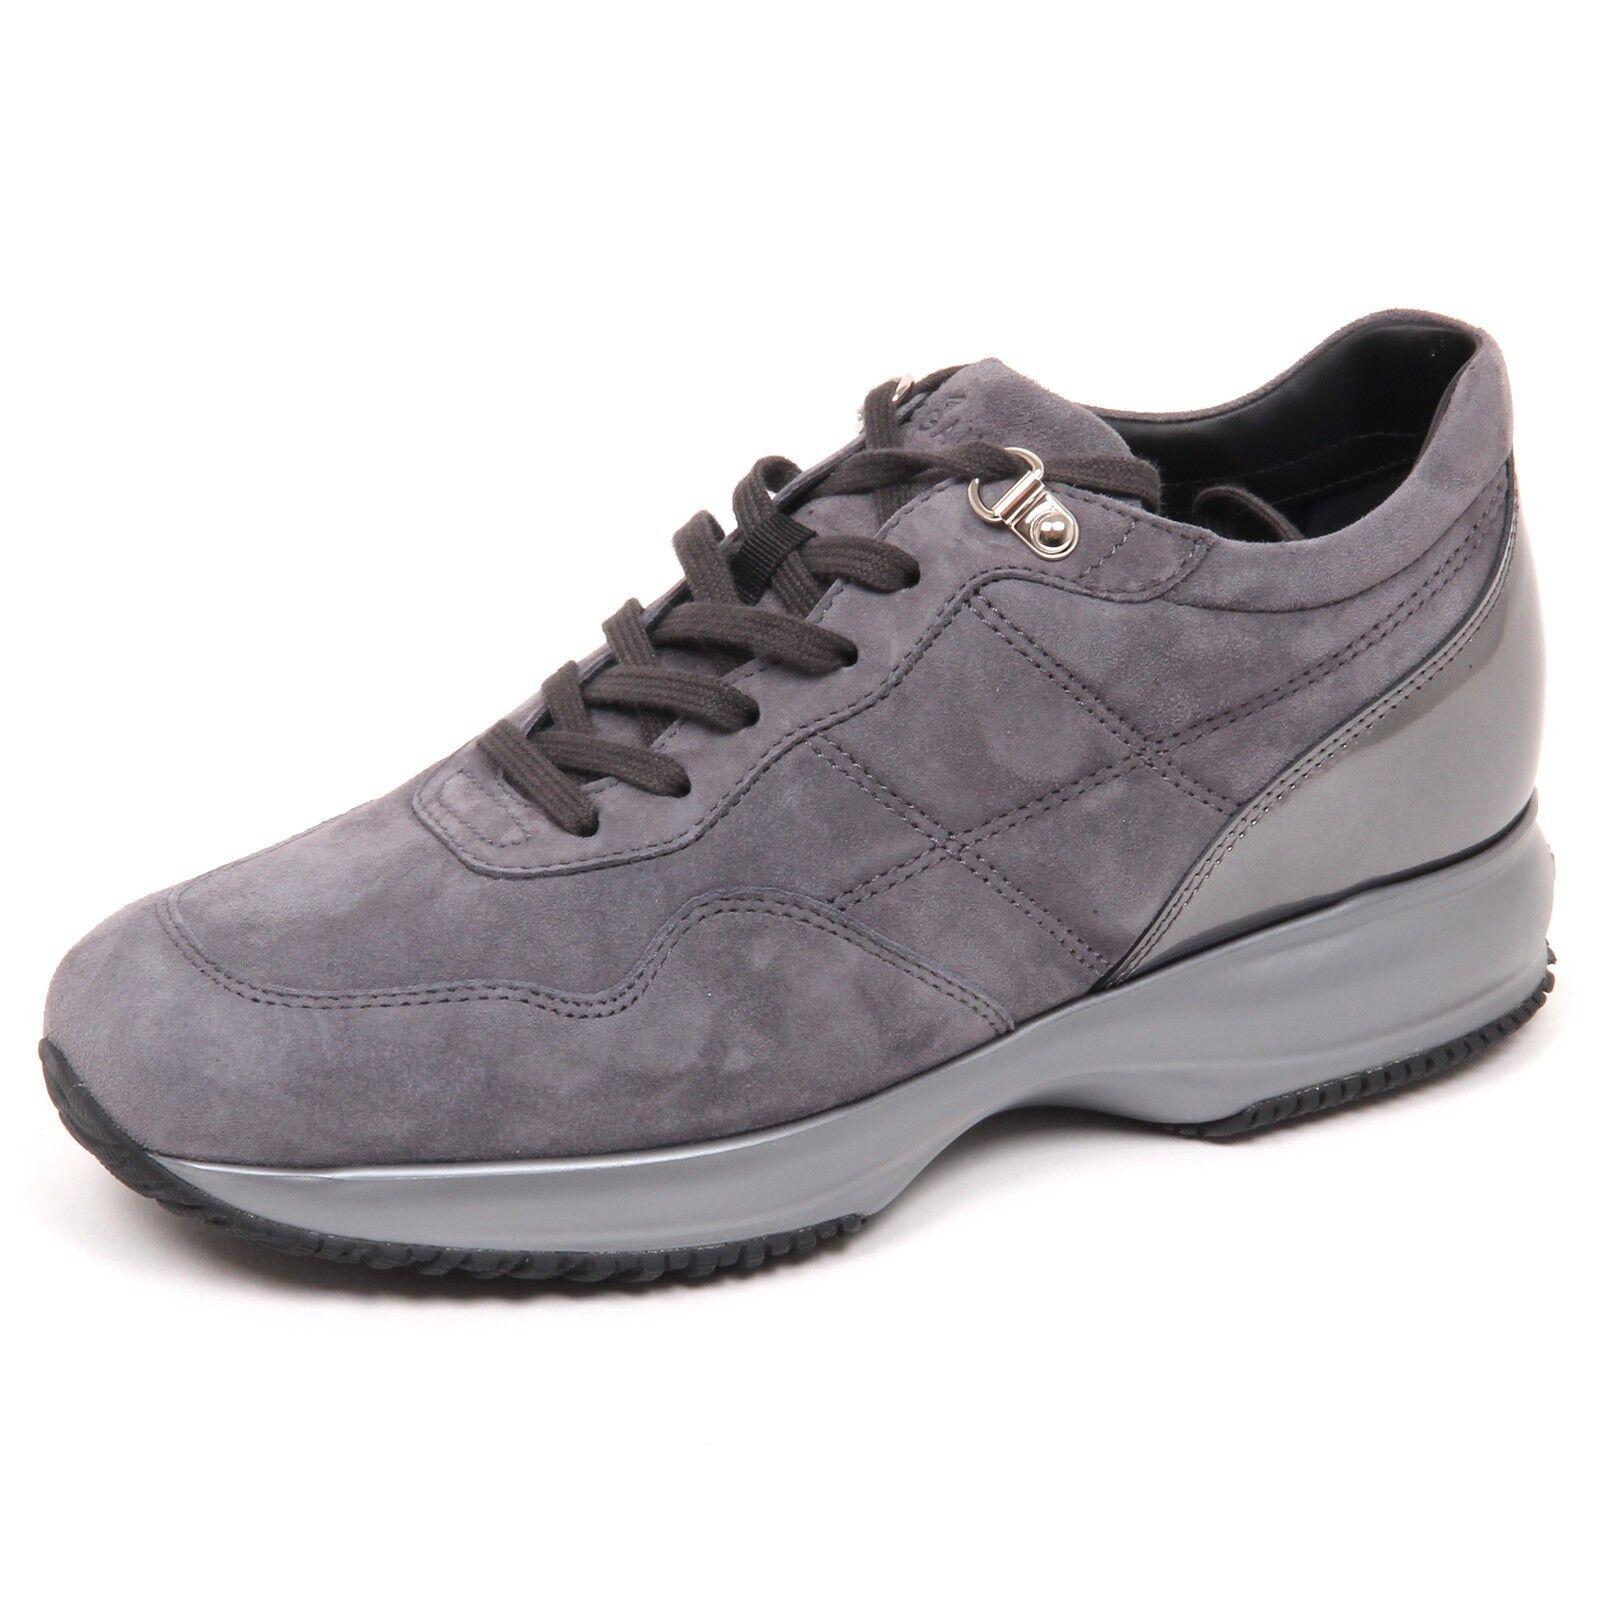 E4528 sneaker donna grey HOGBN INTERBCTIVE scarpe H cucitura shoe woman